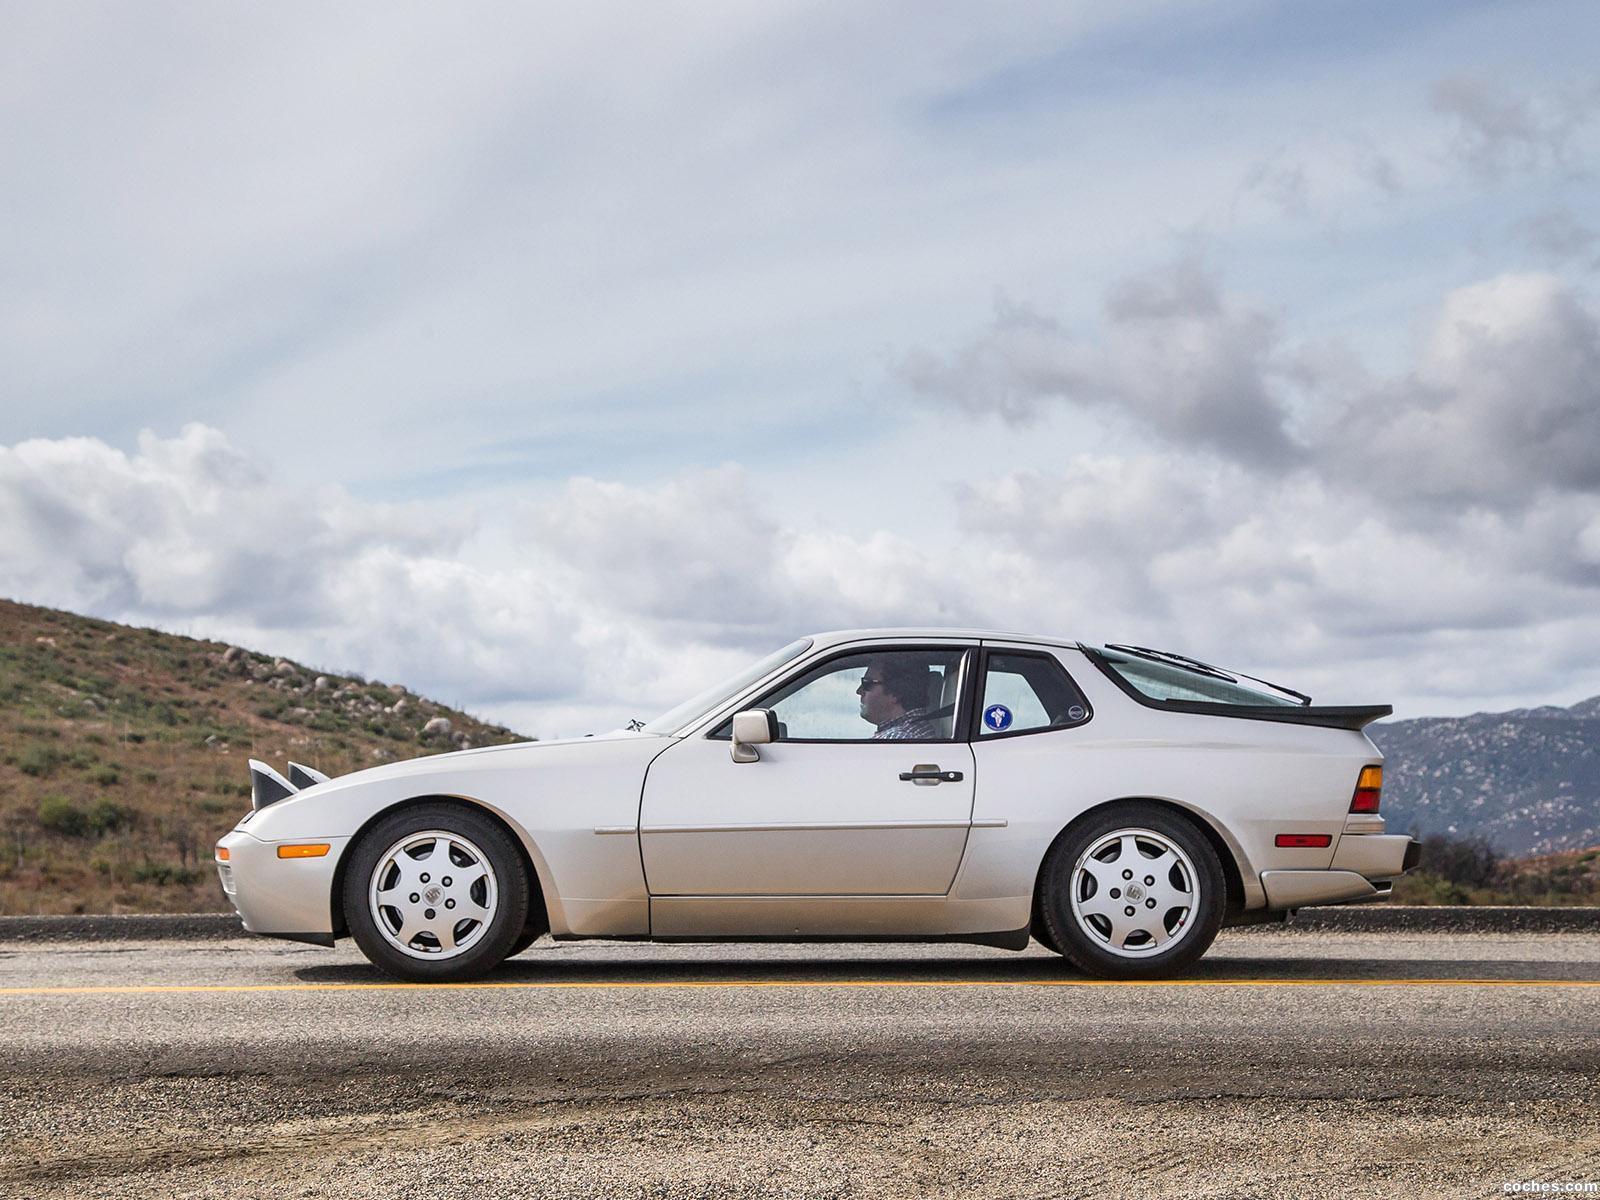 Foto 1 de Porsche 944 S2 USA 1989